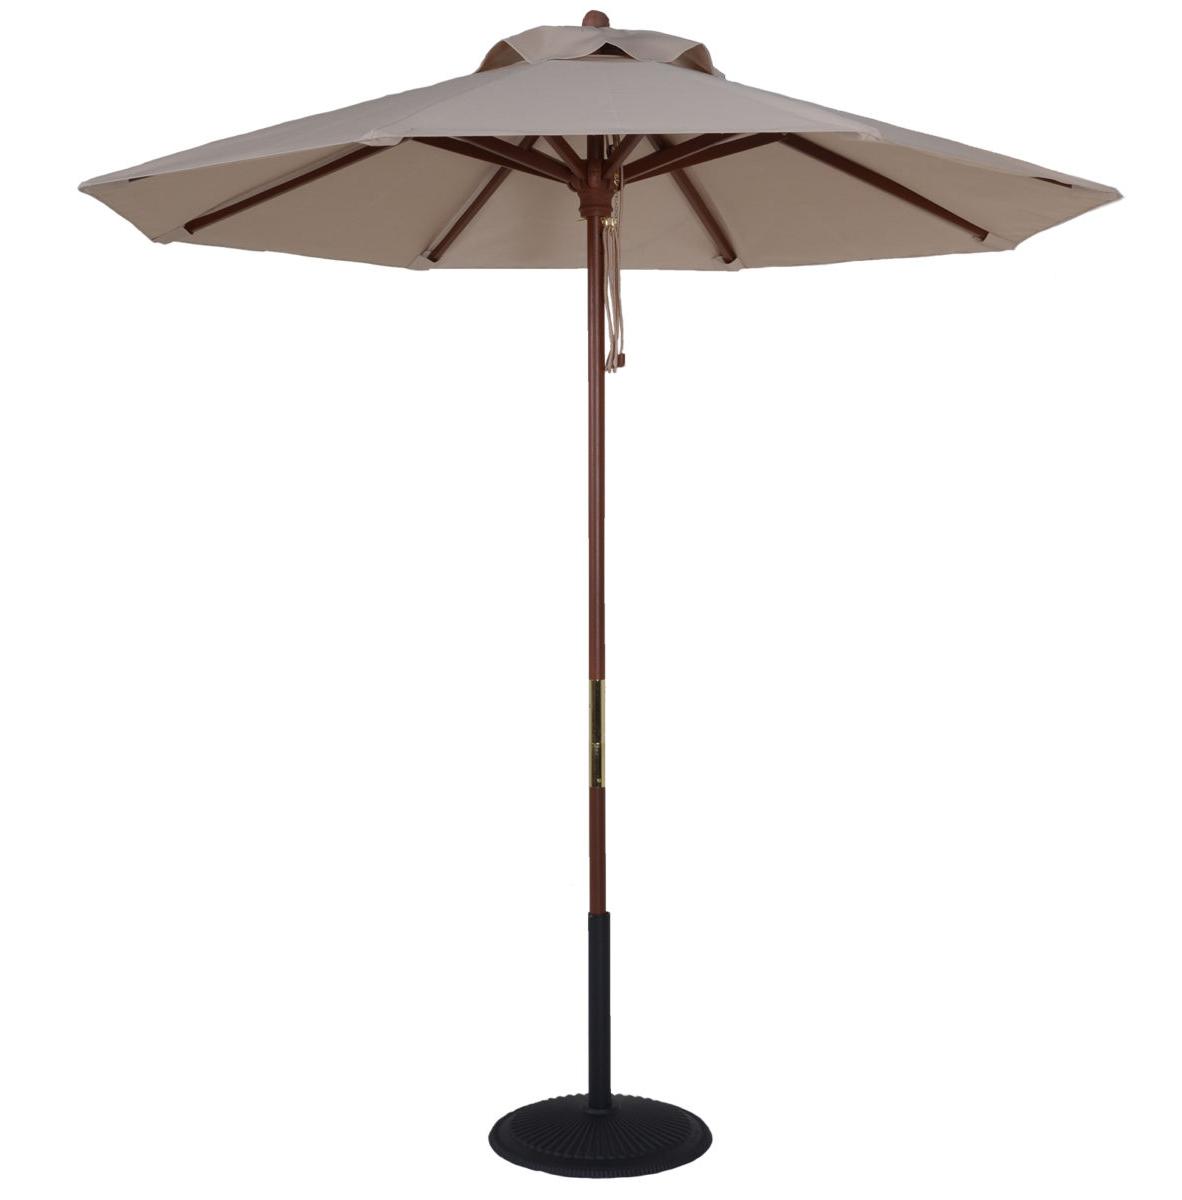 9 Ft. Wood Market Umbrella For Latest Market Umbrellas (Gallery 20 of 20)